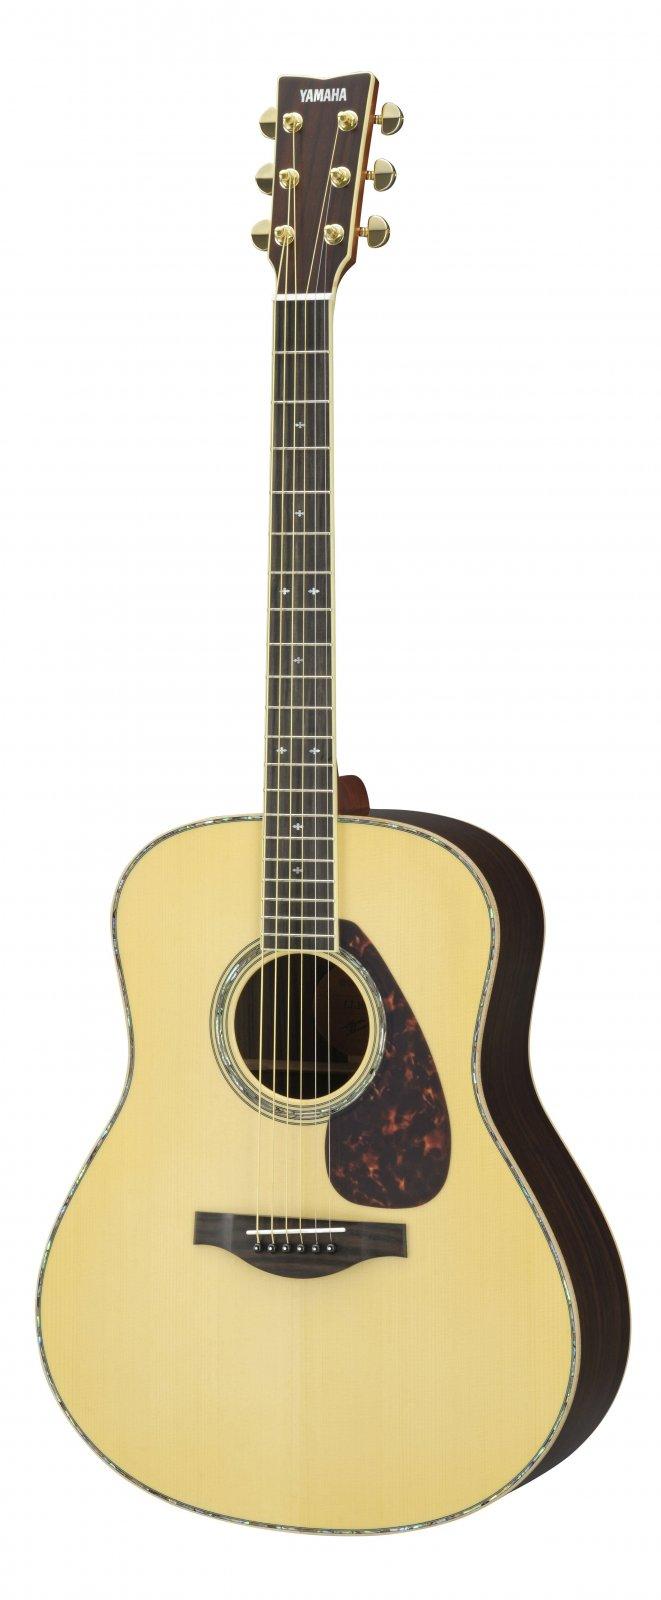 Yamaha LL16D ARE Dreadnought Acoustic Gutiar, Solid Englemann Top - Natural